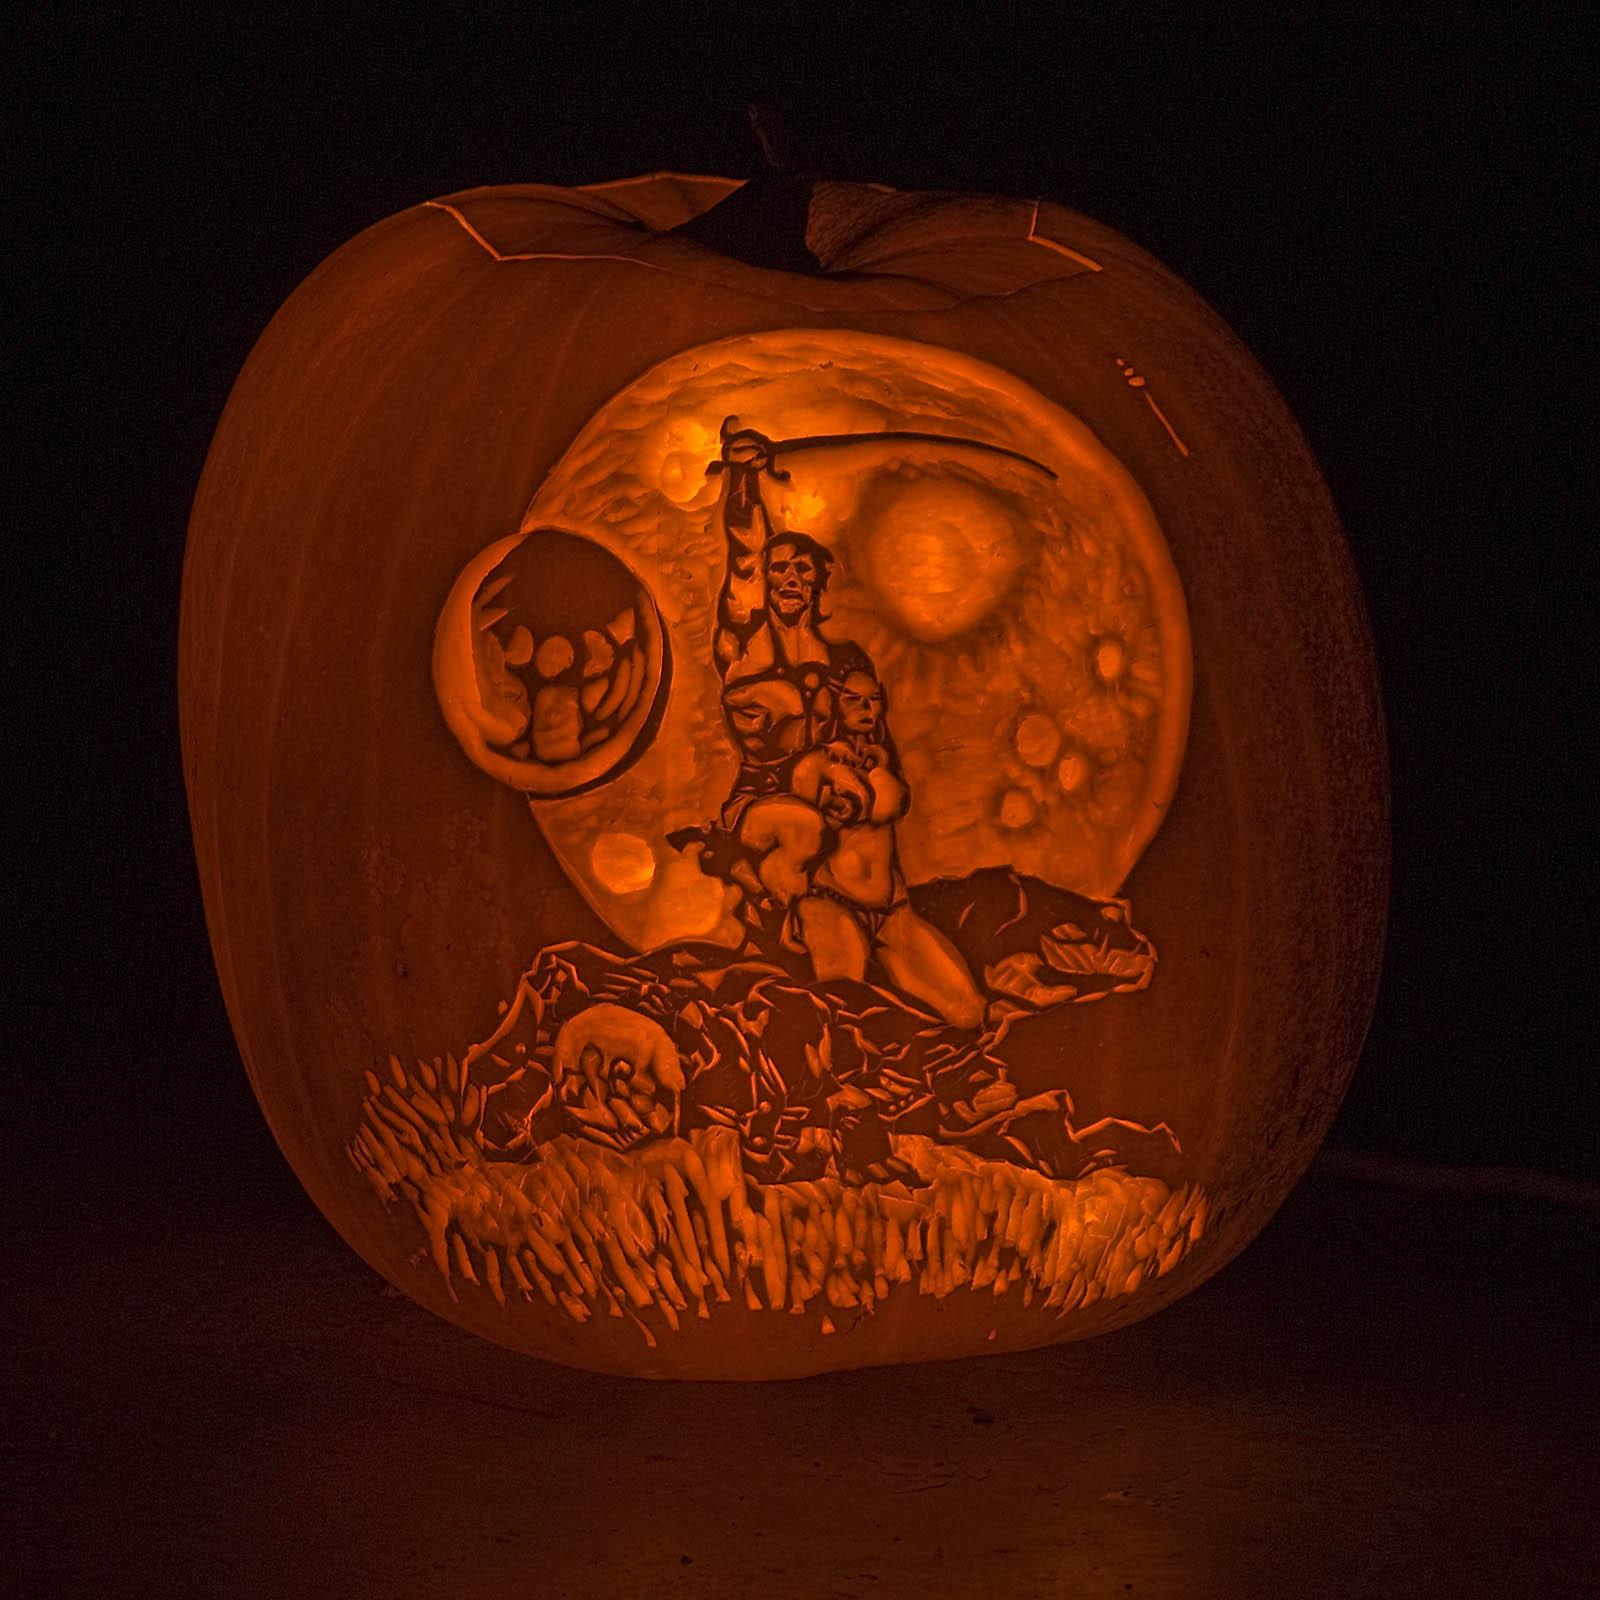 A Princess Of Mars - Pumpkin by Crasio